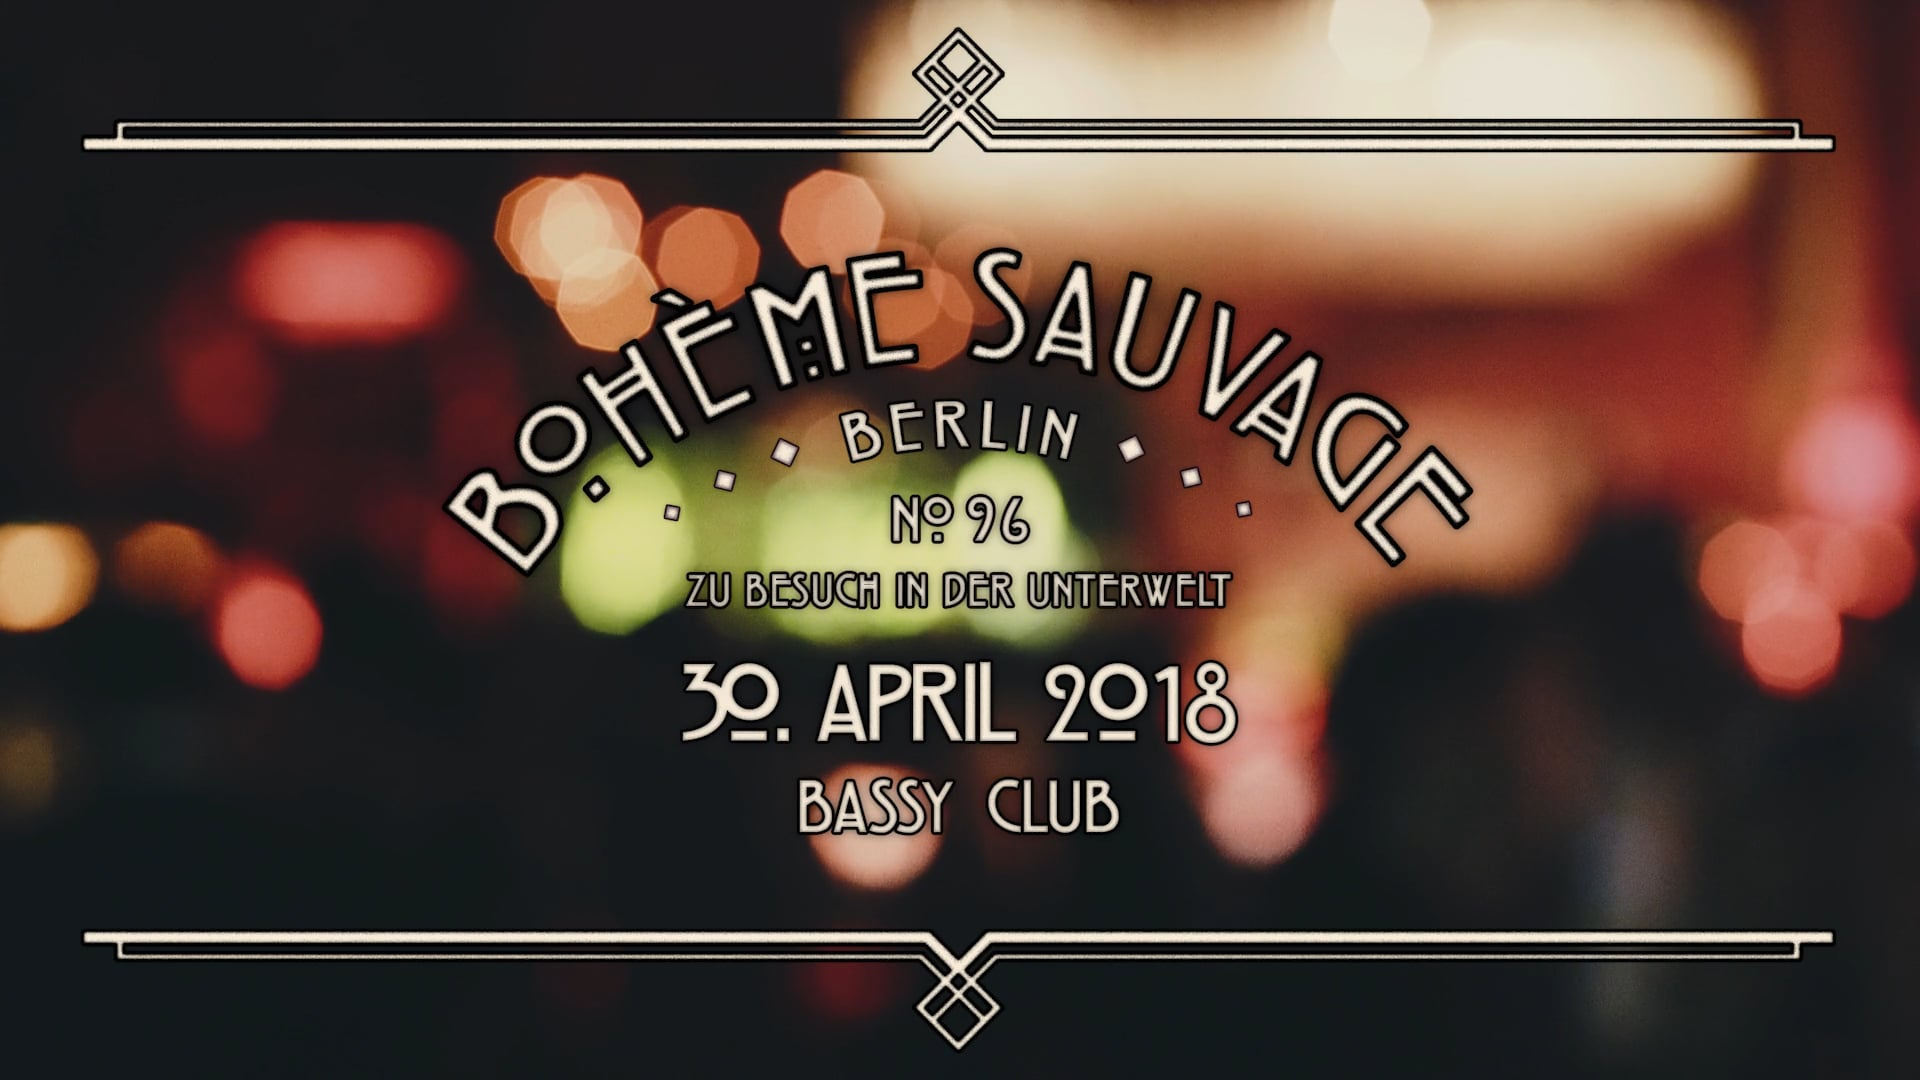 Bohème Sauvage Berlin Nº96 - 30. April 2018 - Bassy Club